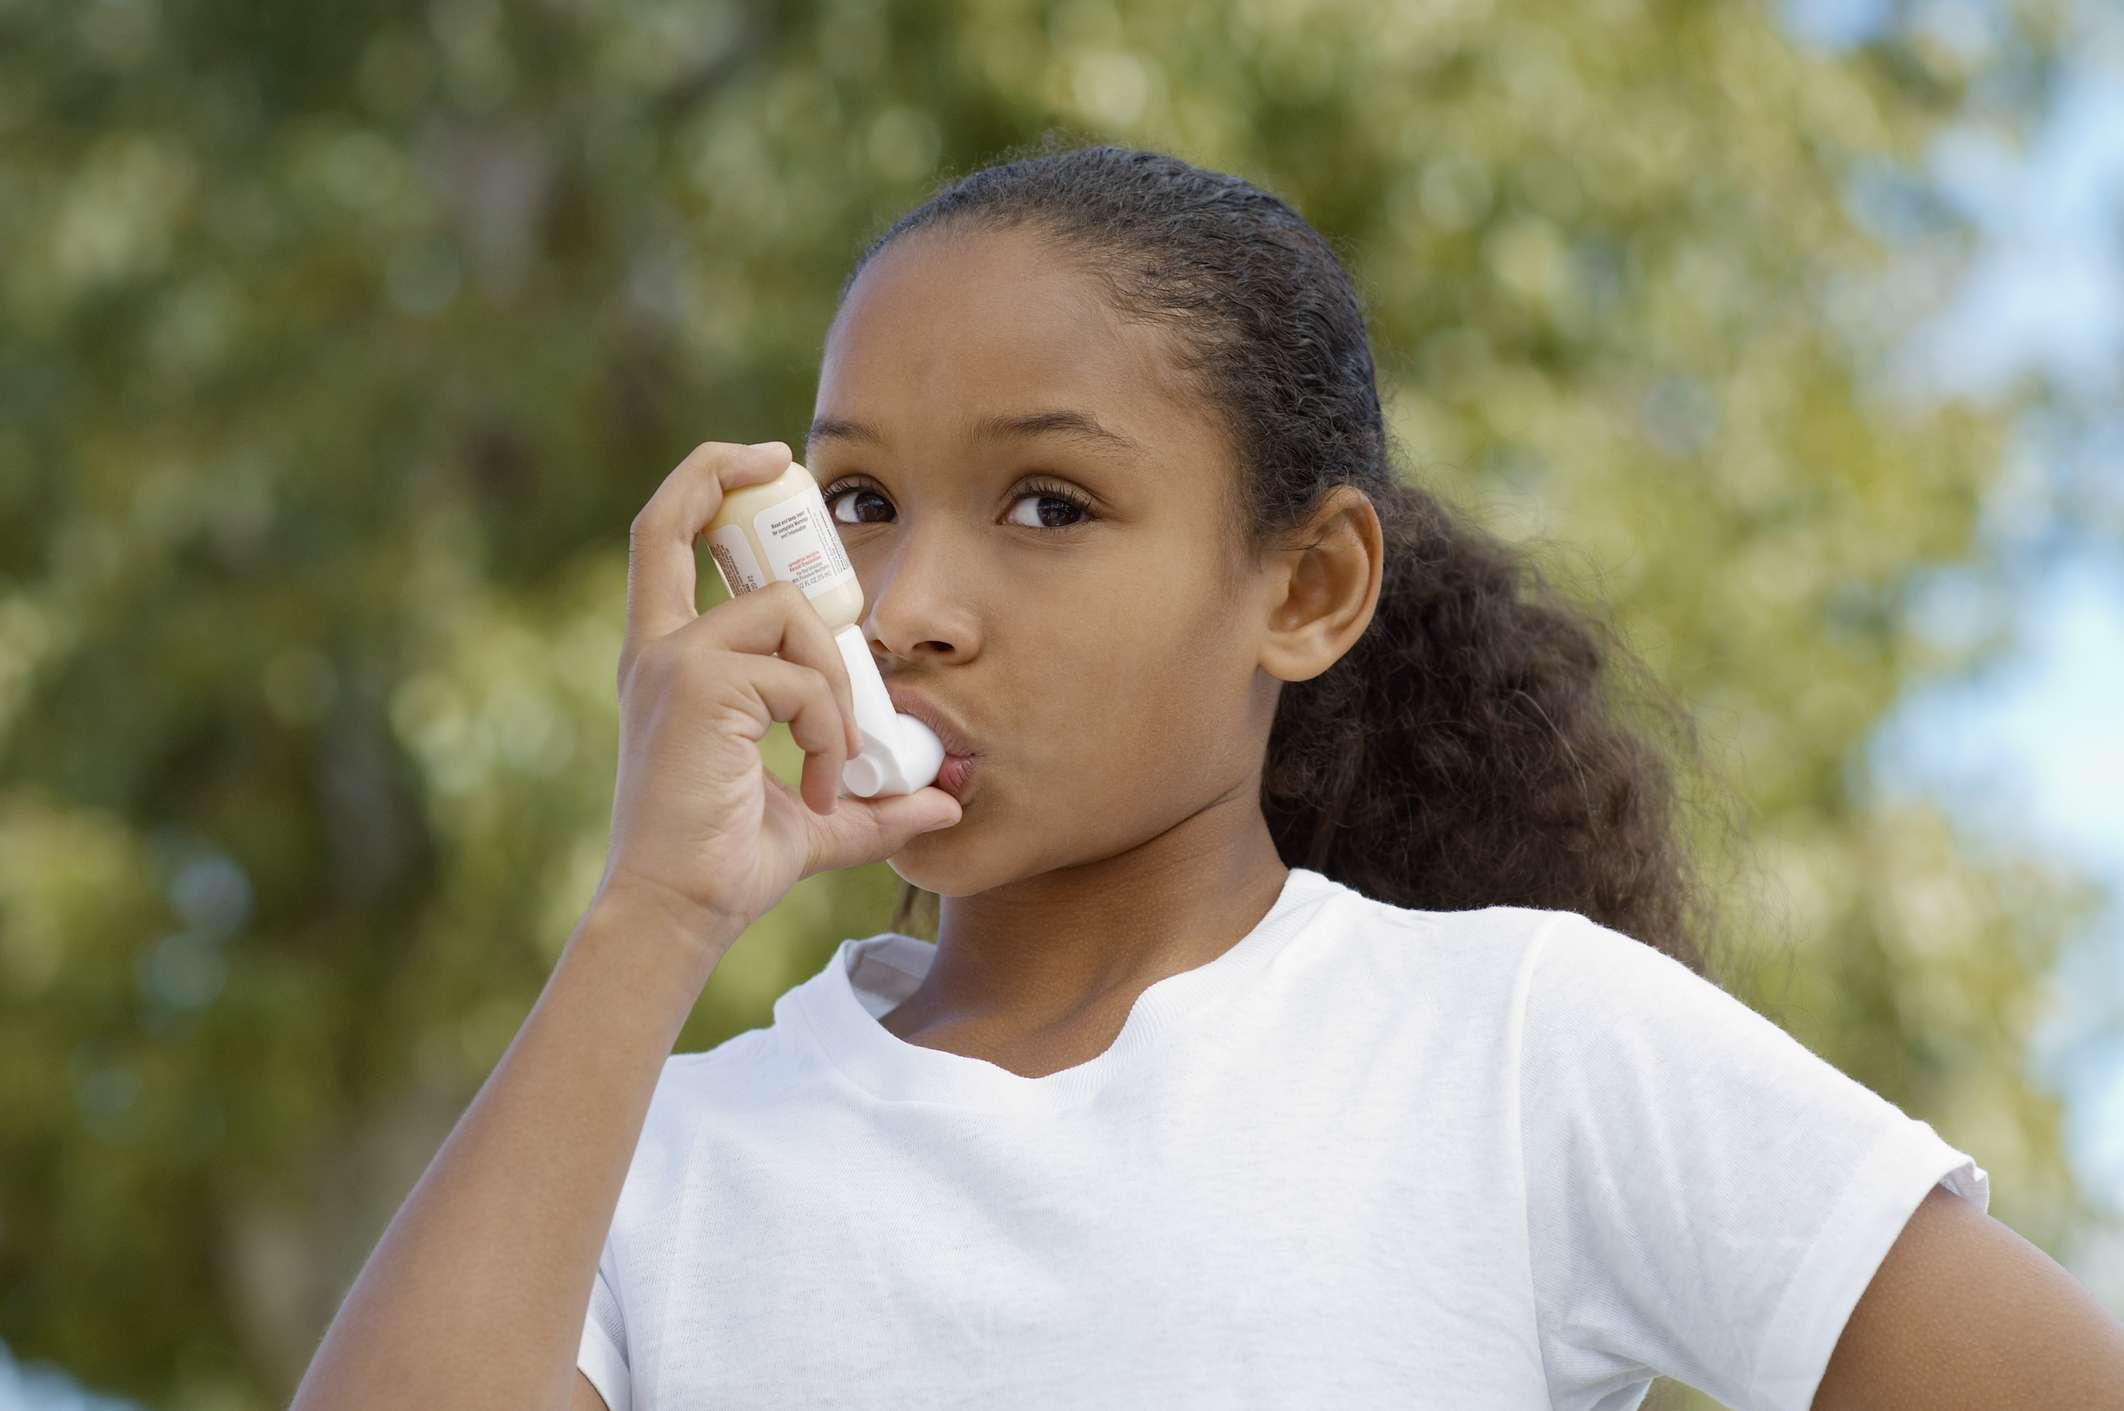 young girl using asthma inhaler